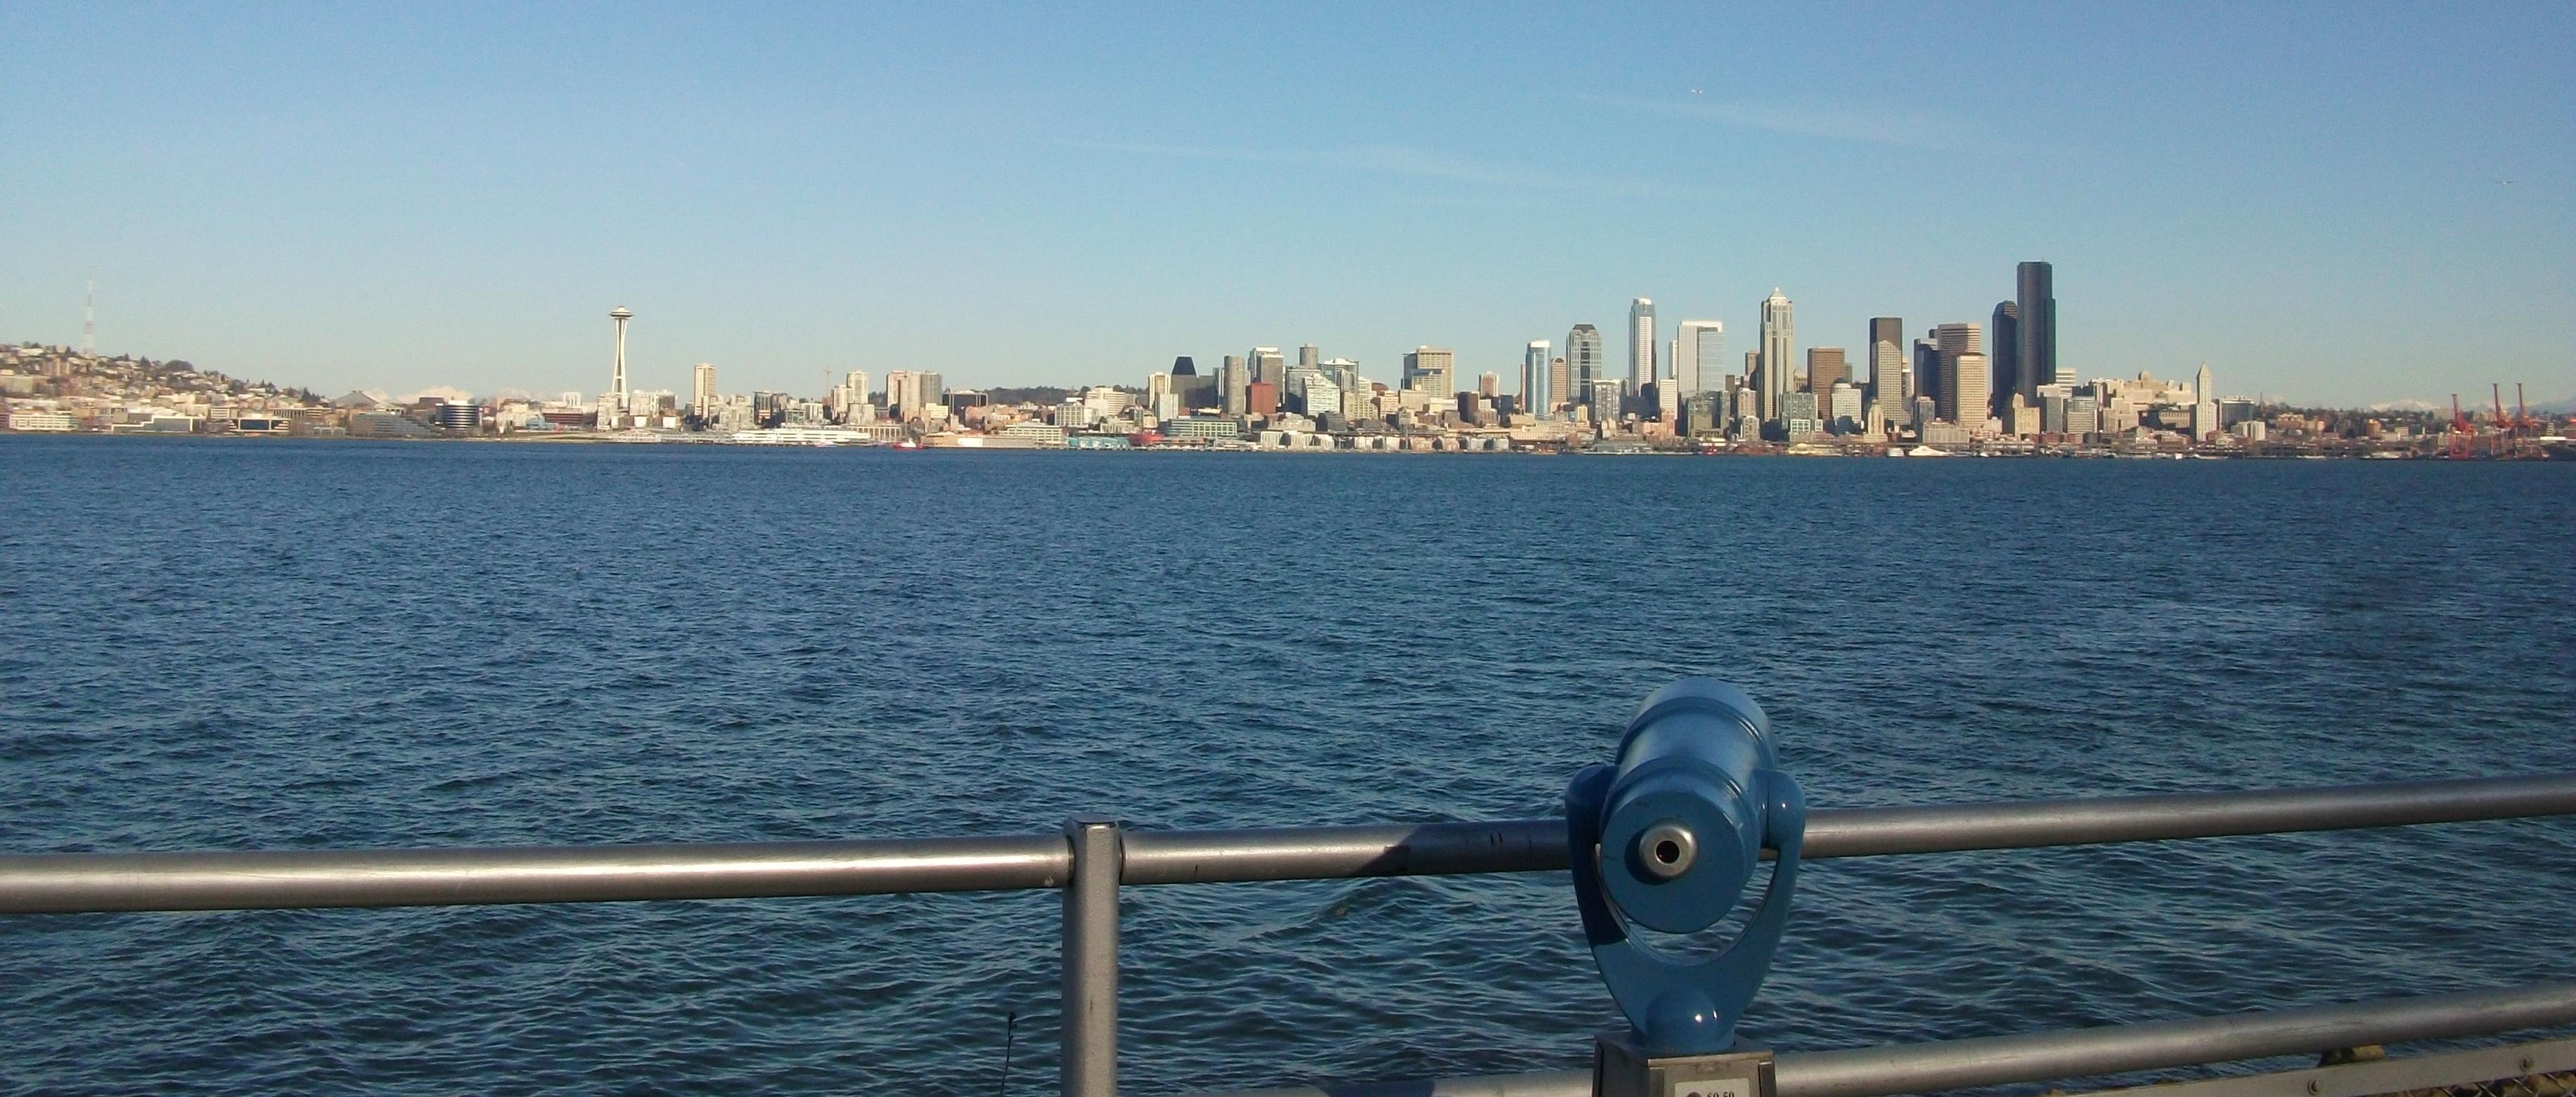 Seattle Skyline Looking East